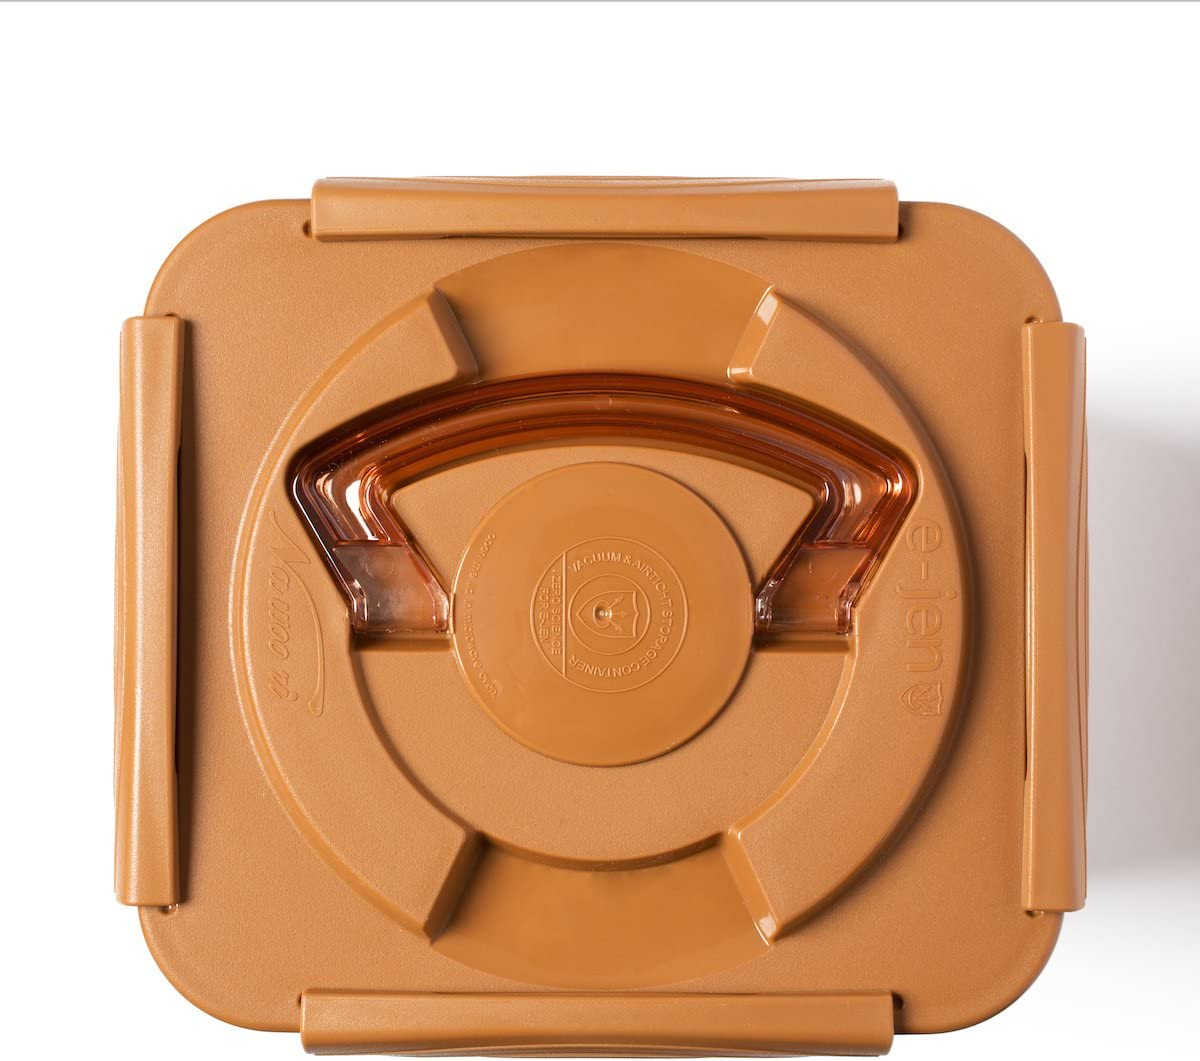 0.4 Gal Sandy Brown Sauerkraut Fermentation and Storage Container with Inner Vacuum Lid Crazy Korean Cooking Premium Kimchi 1.7L